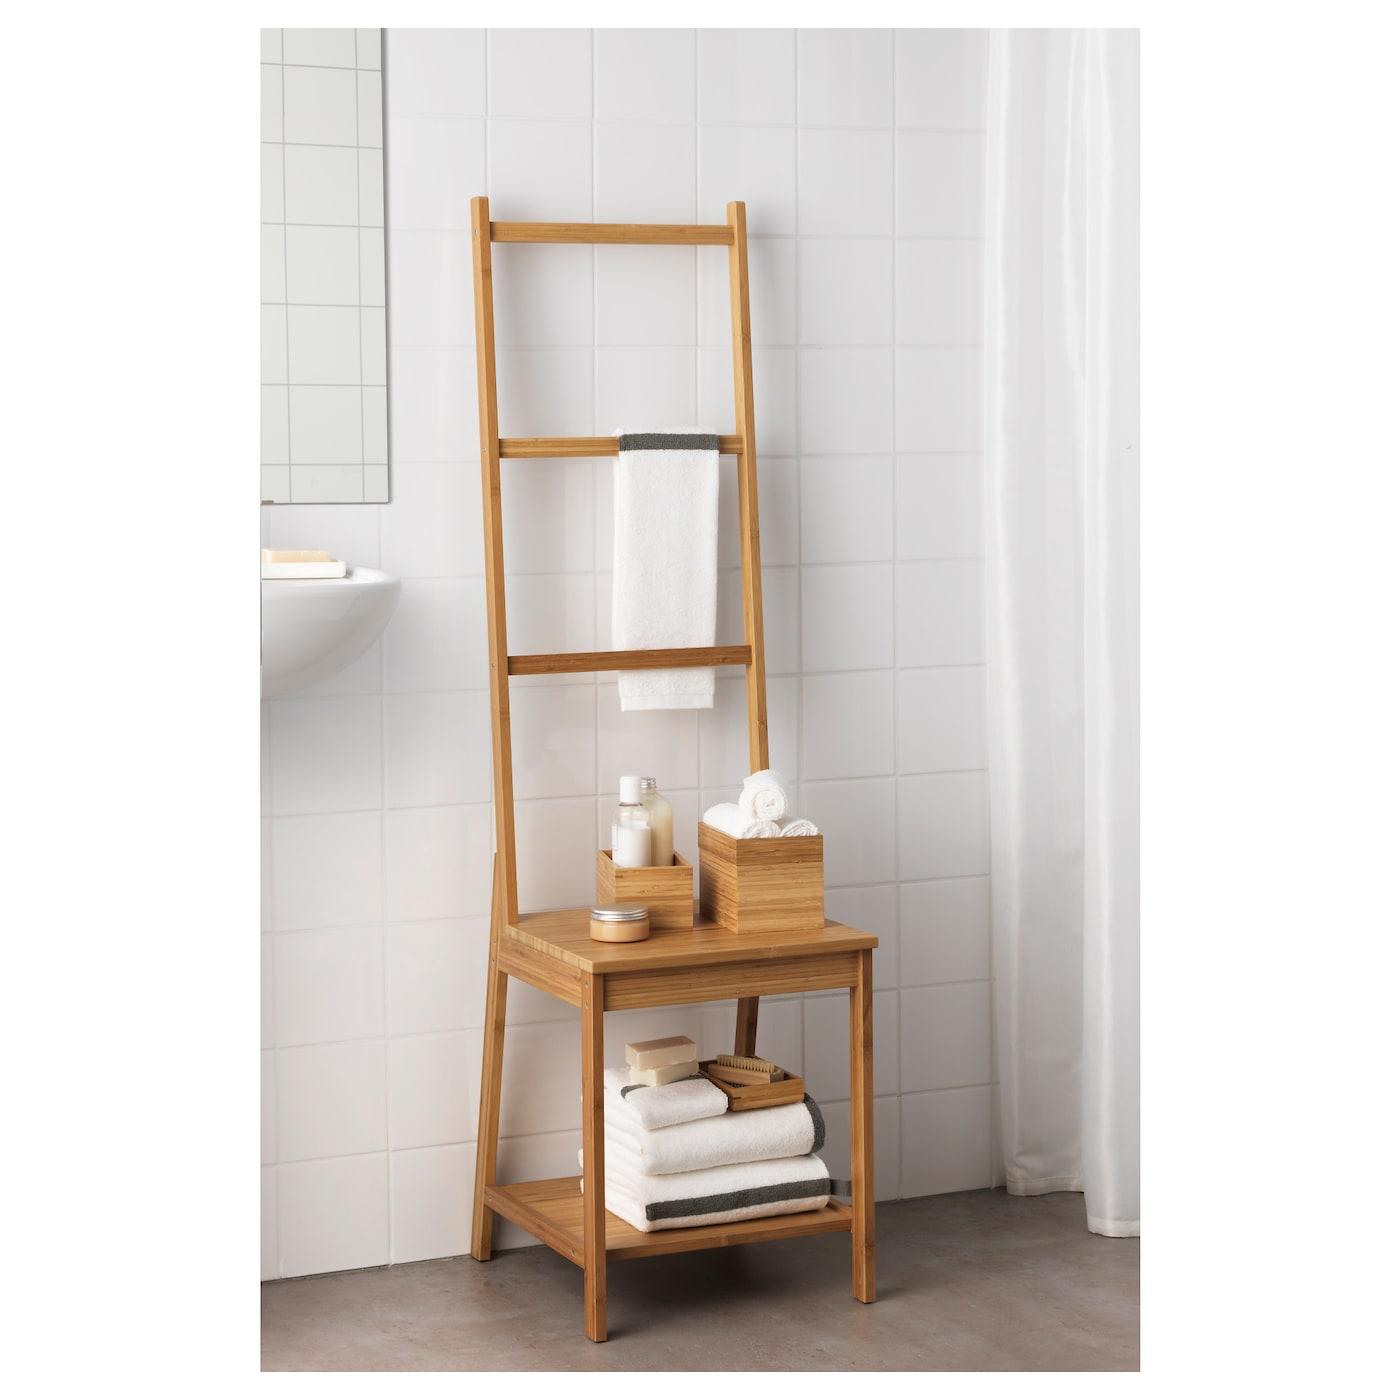 Ikea rågrund towel rack chair bamboo is a hardwearing natural material